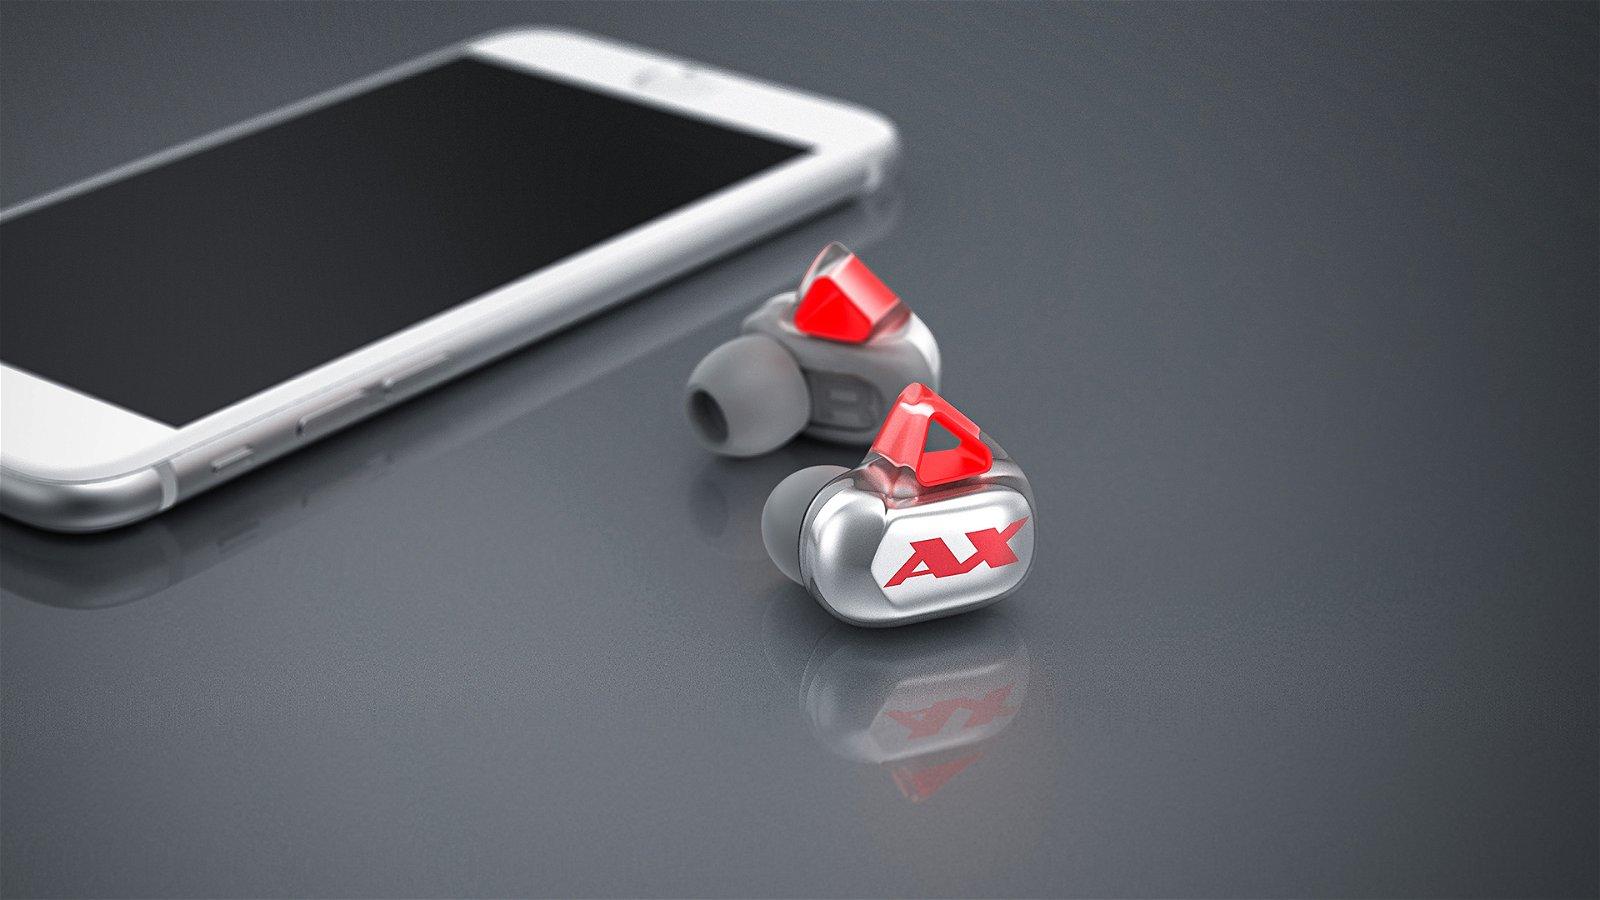 Axum: The Future of Wireless Audio